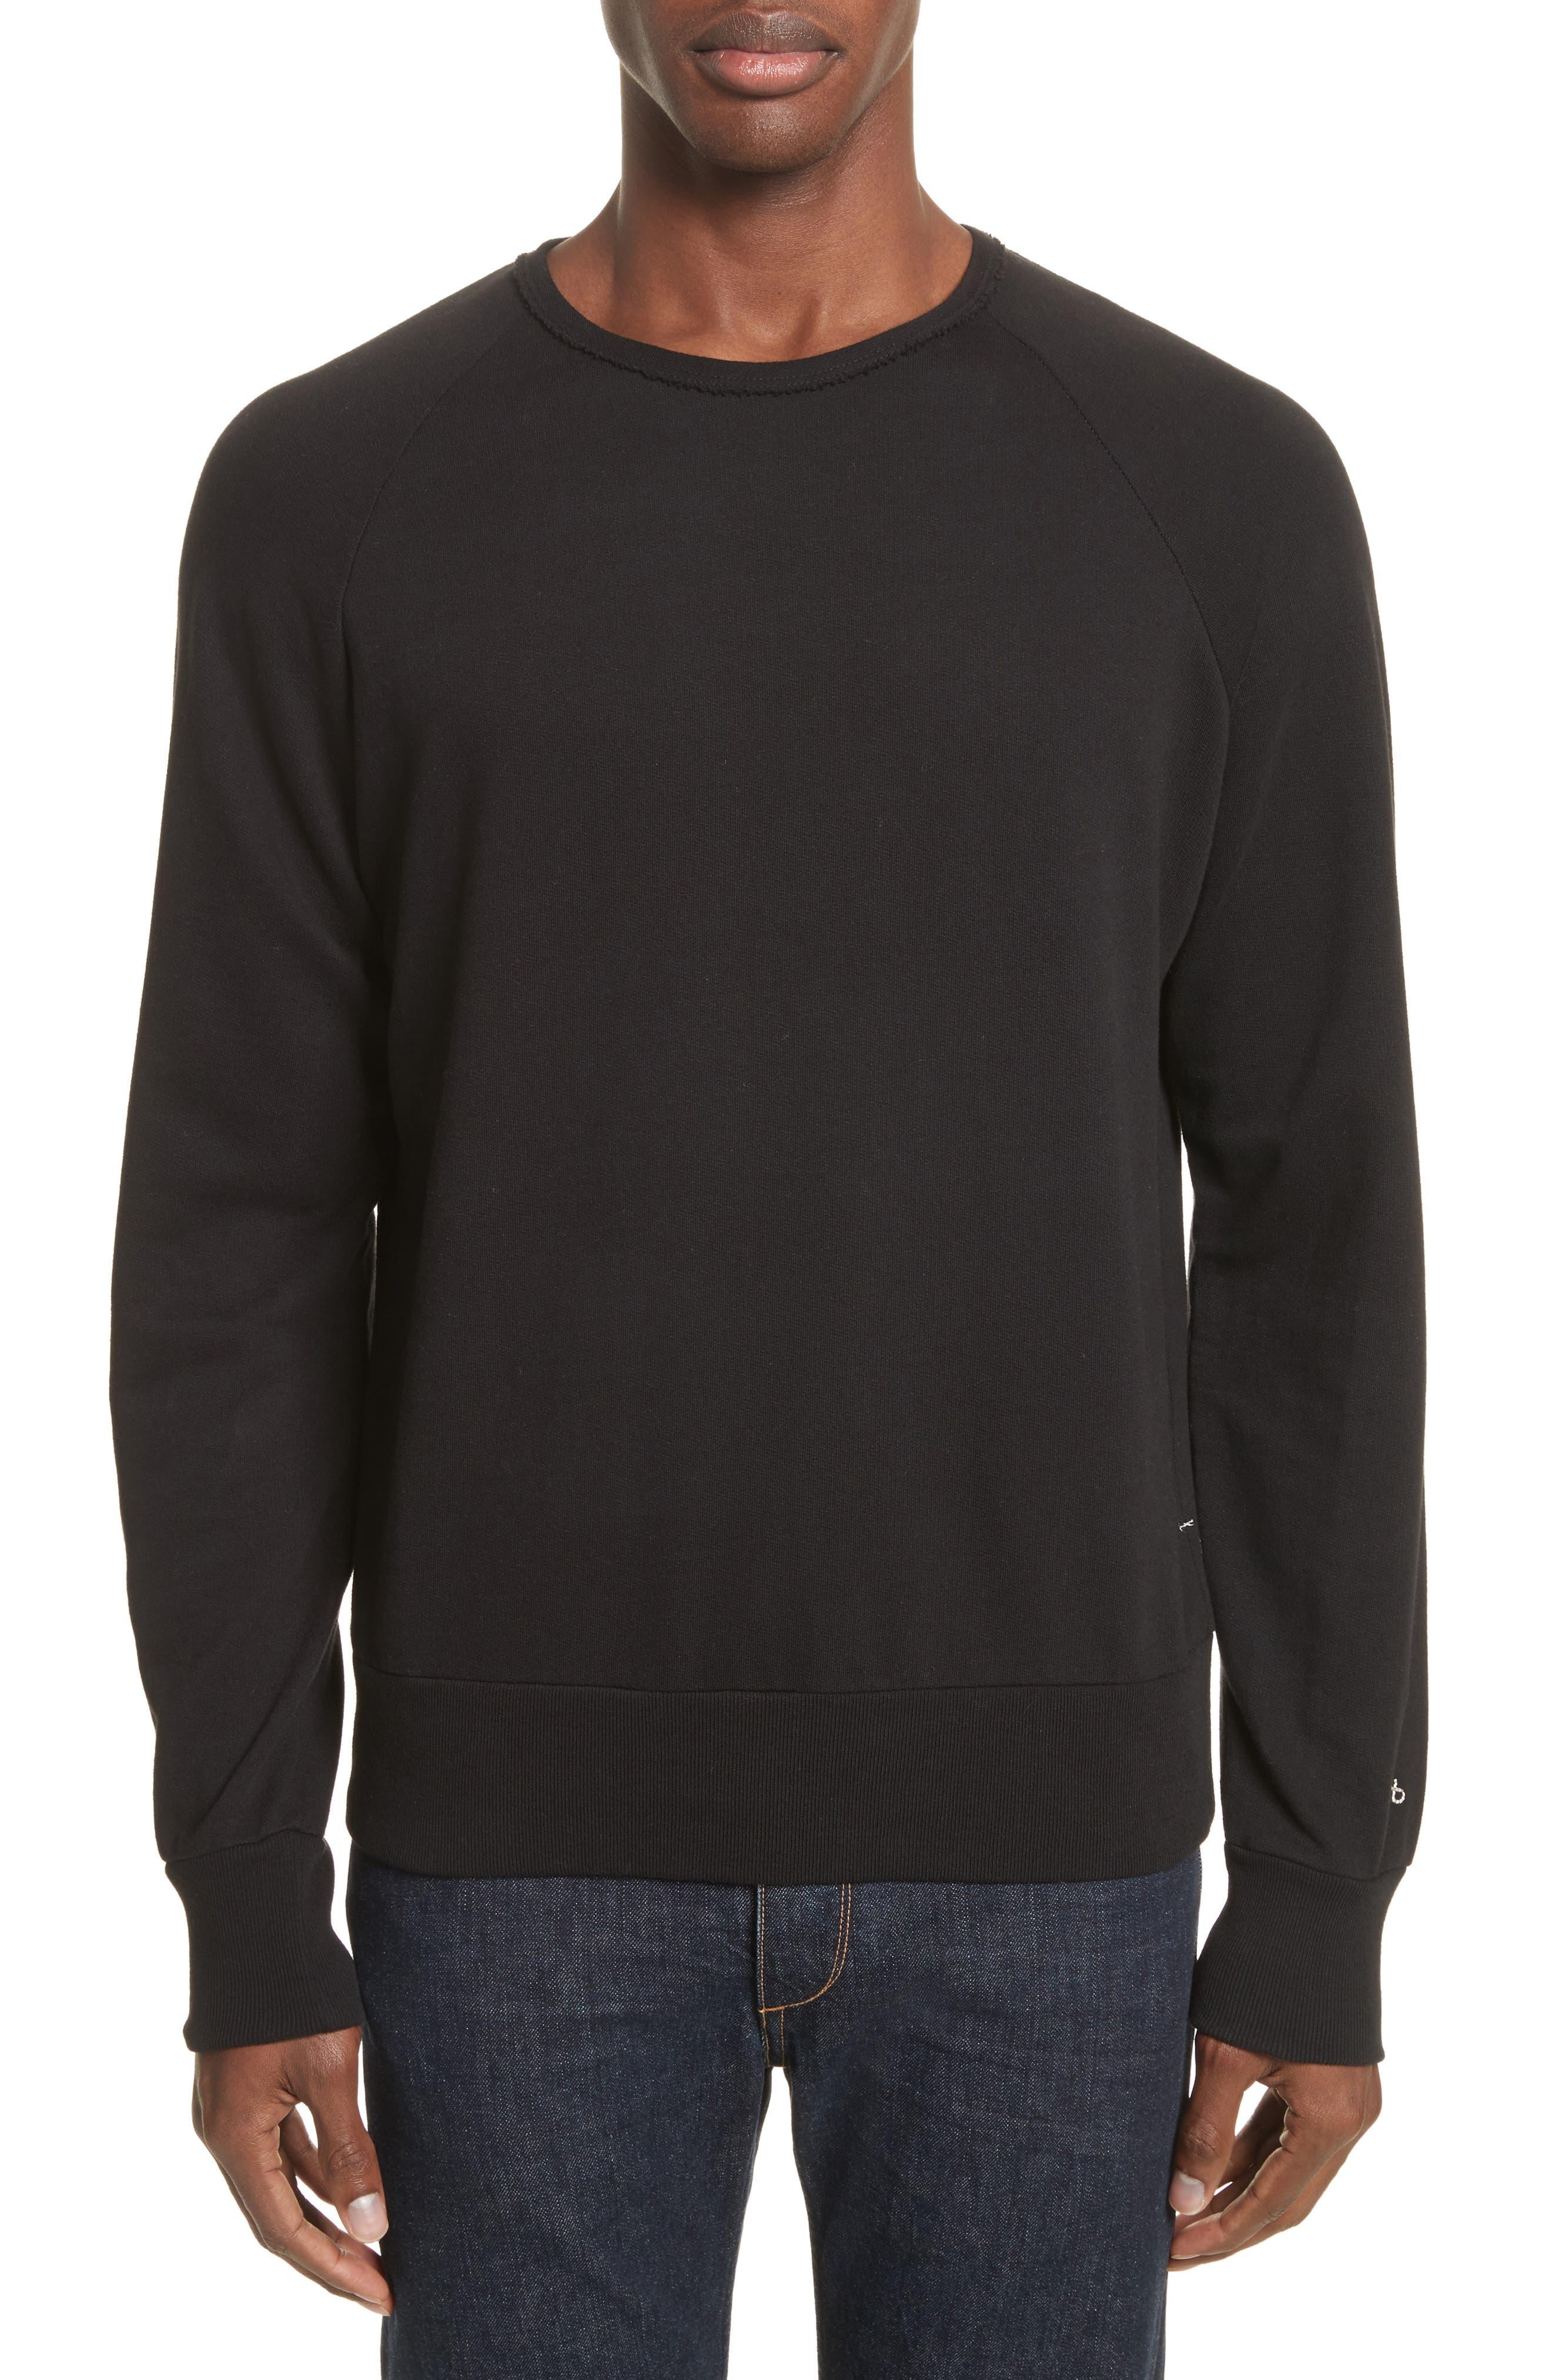 Standard Issue Crewneck Sweatshirt,                         Main,                         color,